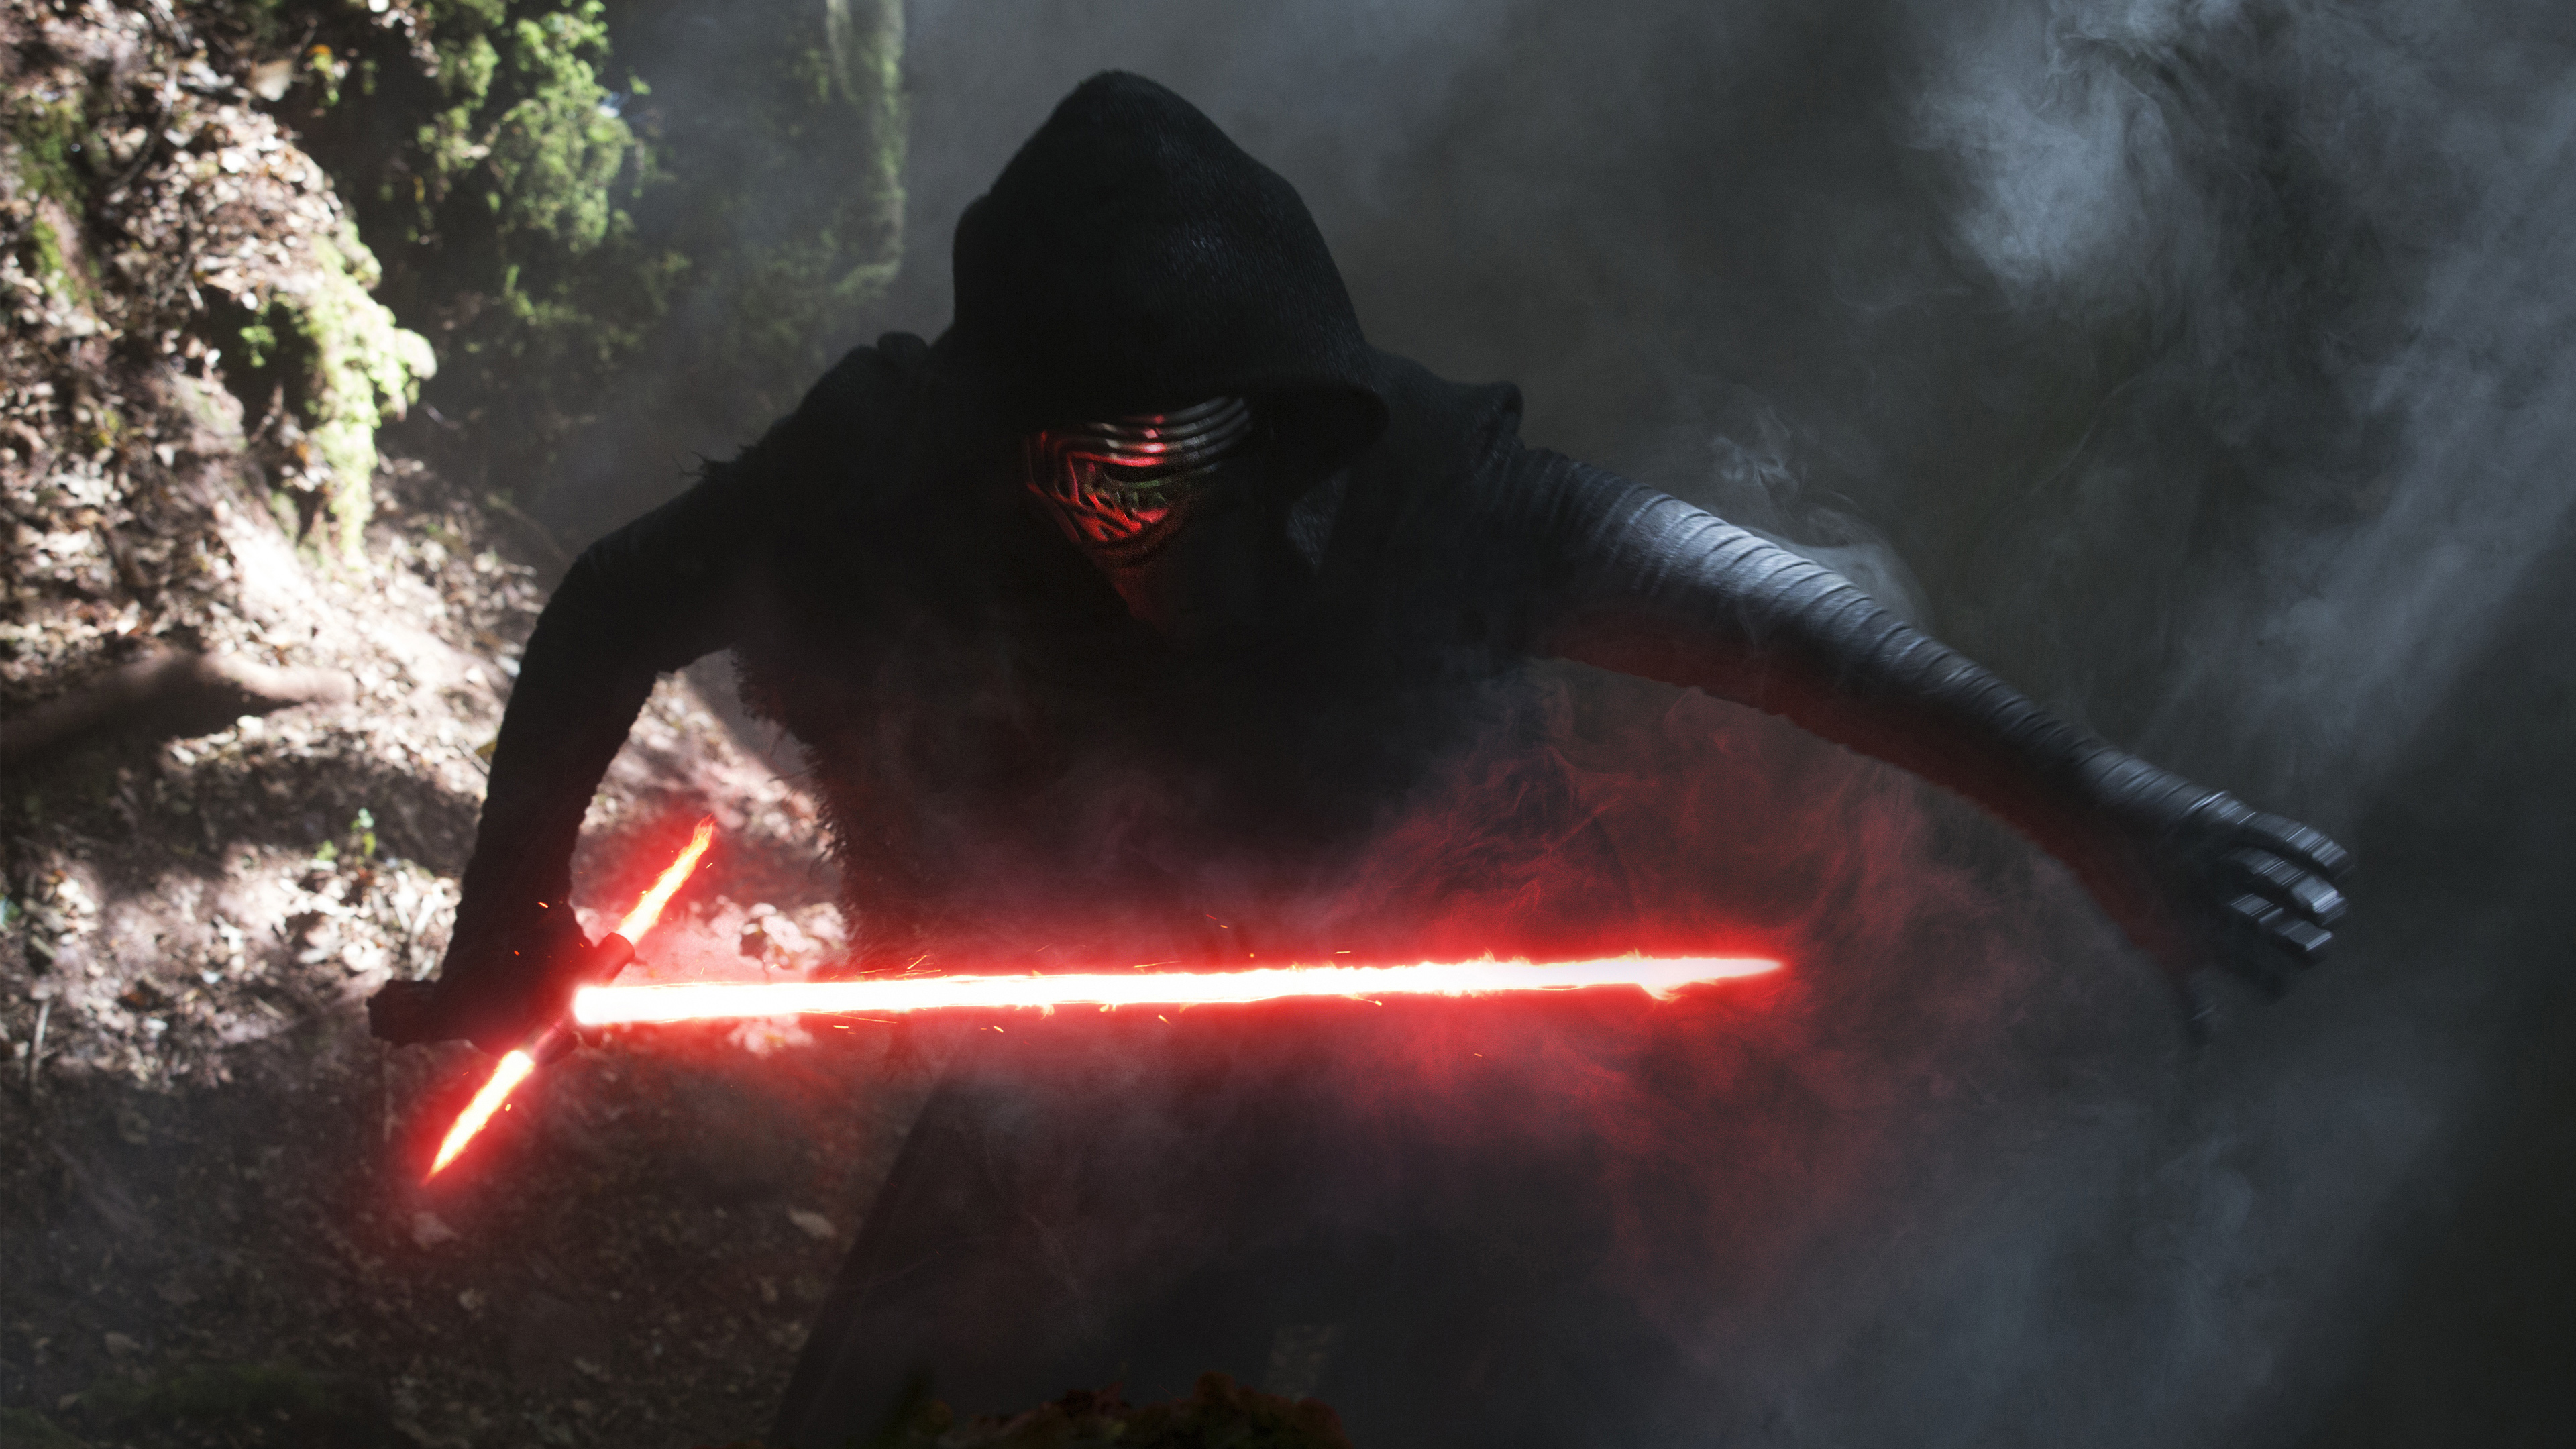 Kylo Ren Star Wars The Force Awakens by hdwallpapersin 3840x2160